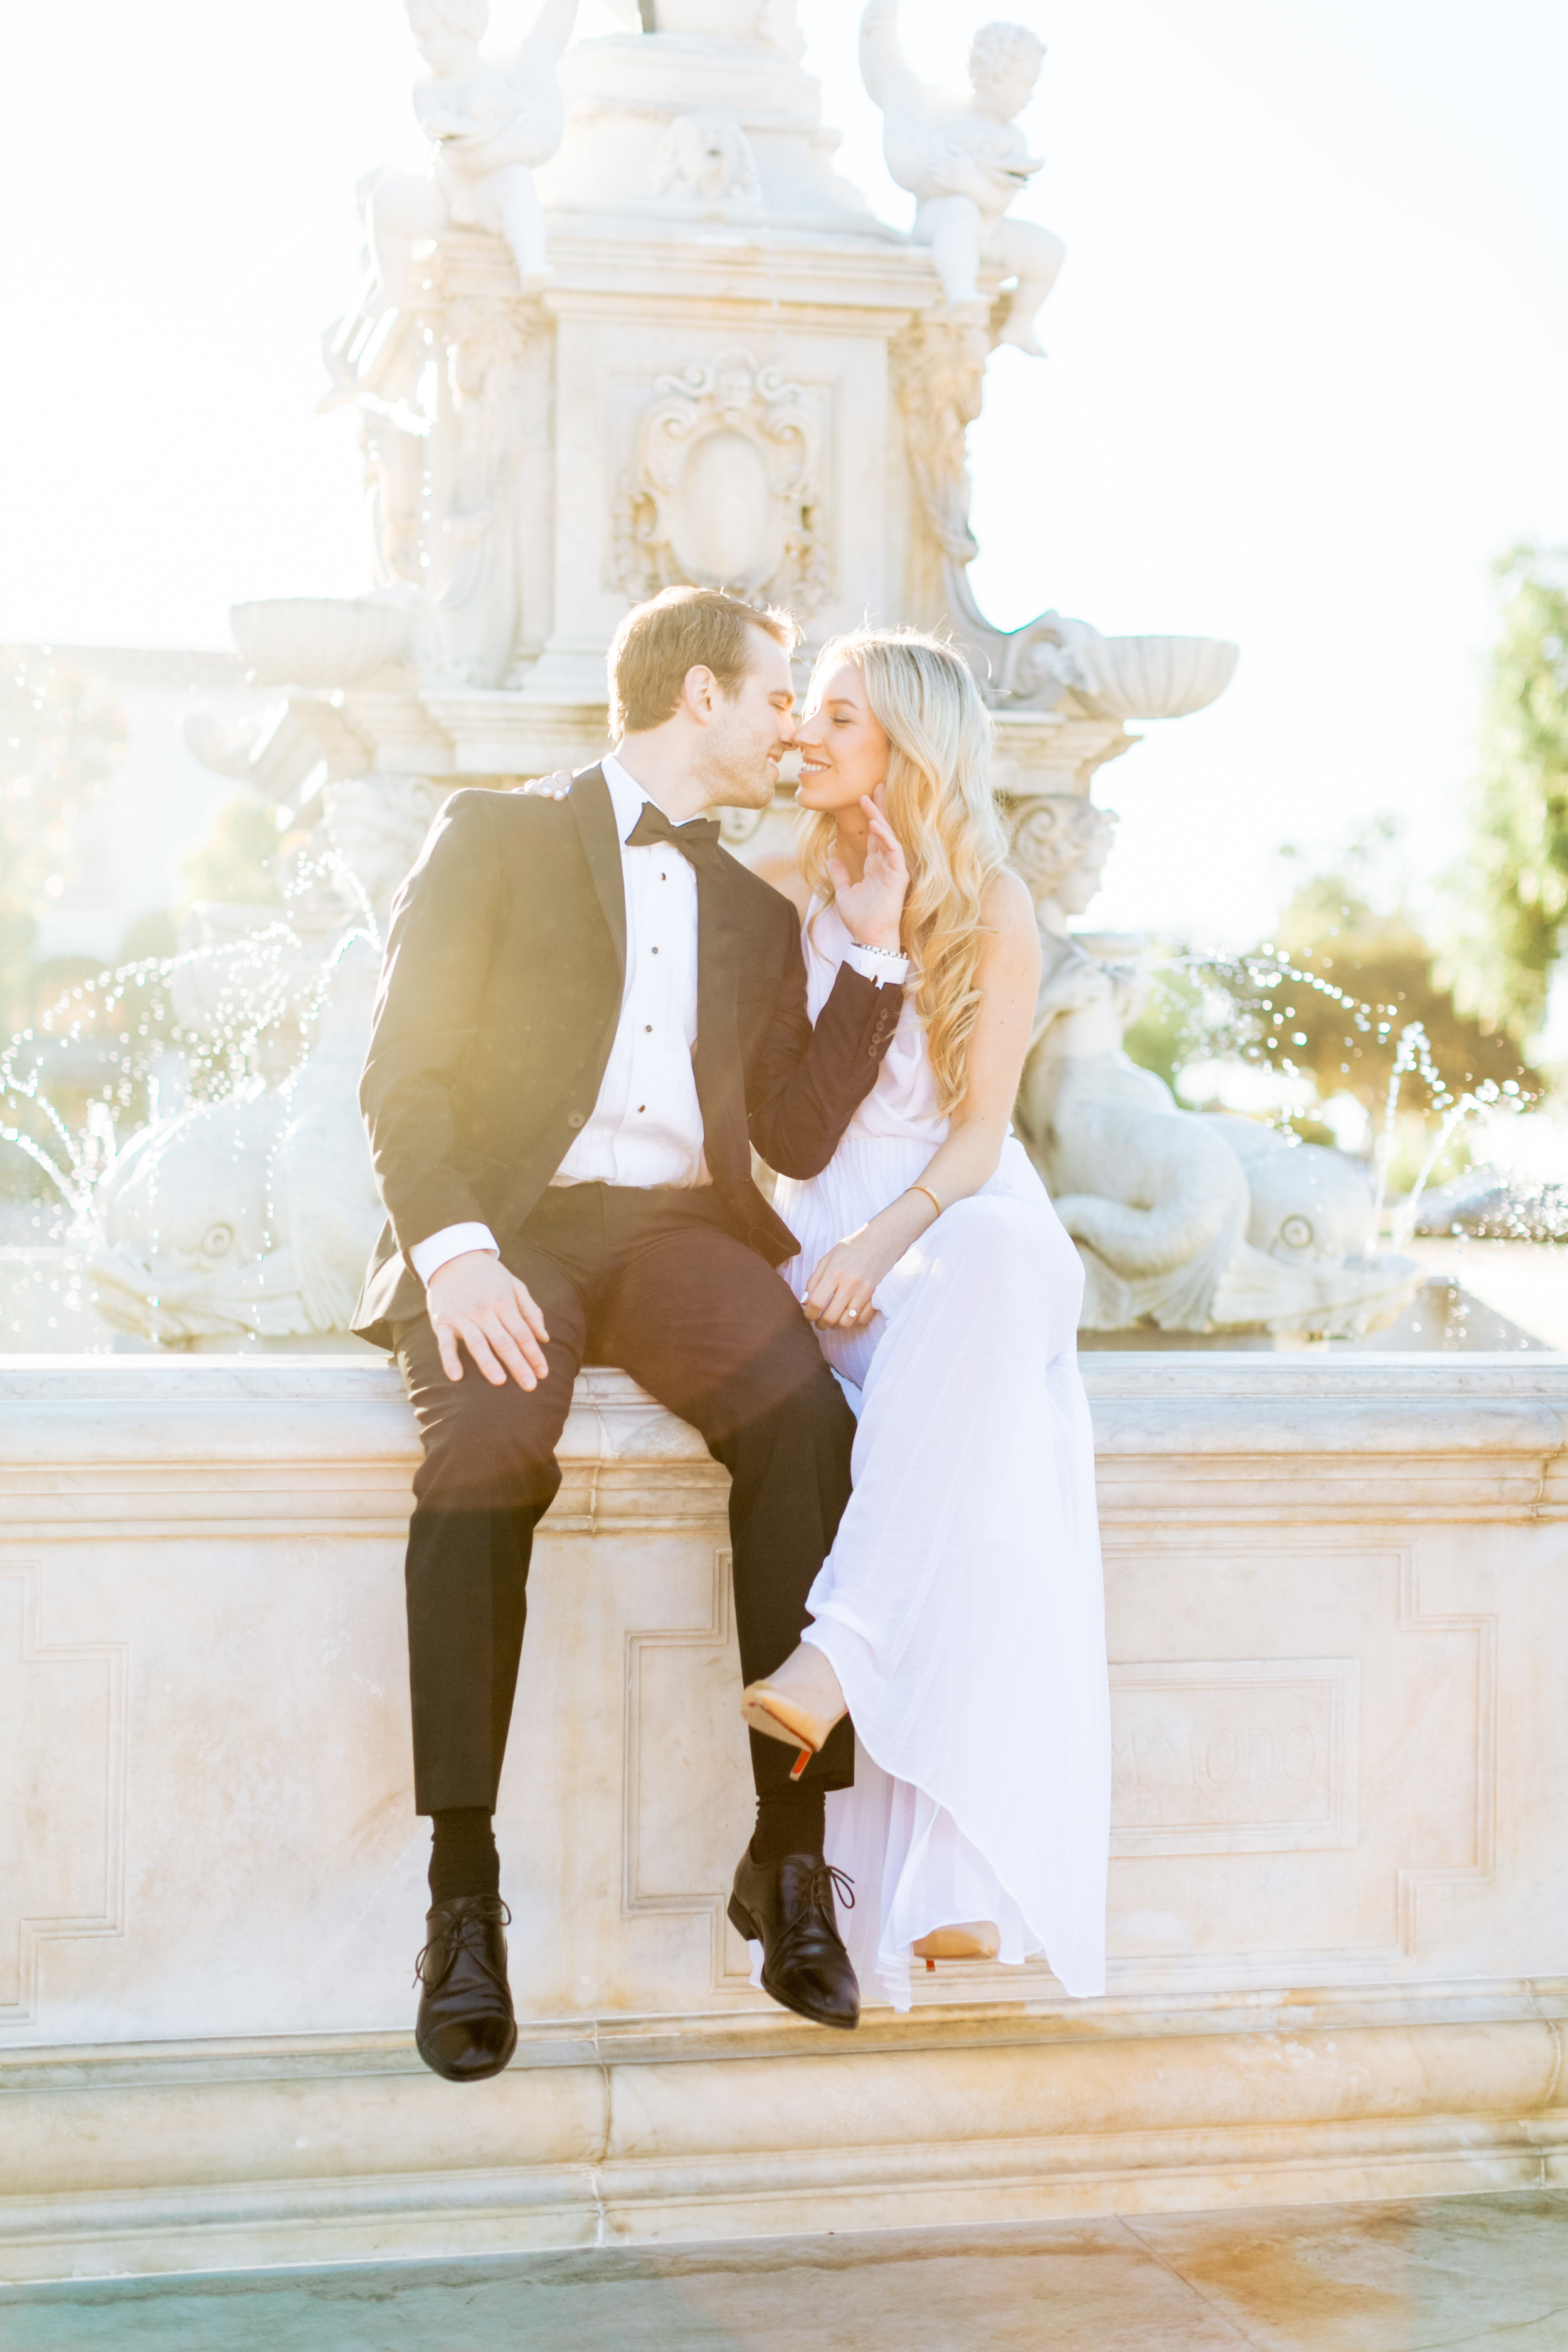 2015Natalie Schutt Photography- Palos Verdes Wedding-47.JPG